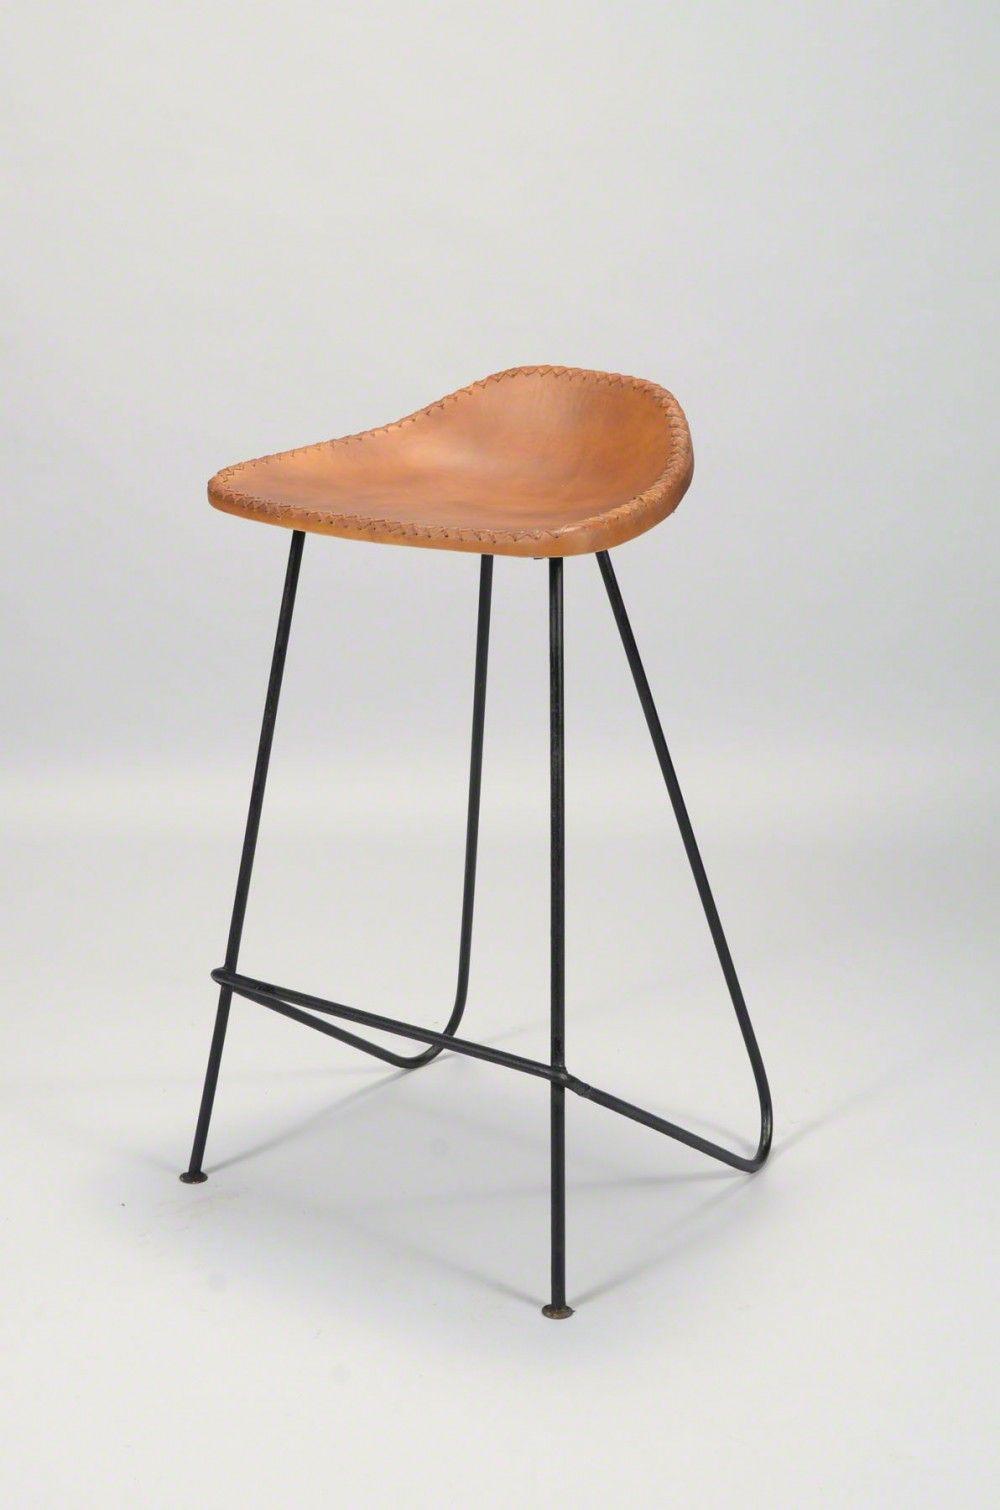 Genial Barhocker Industrie, Hocker Metall Industriedesign, Sitzhöhe 68 Cm    Landhaus Style   Möbel